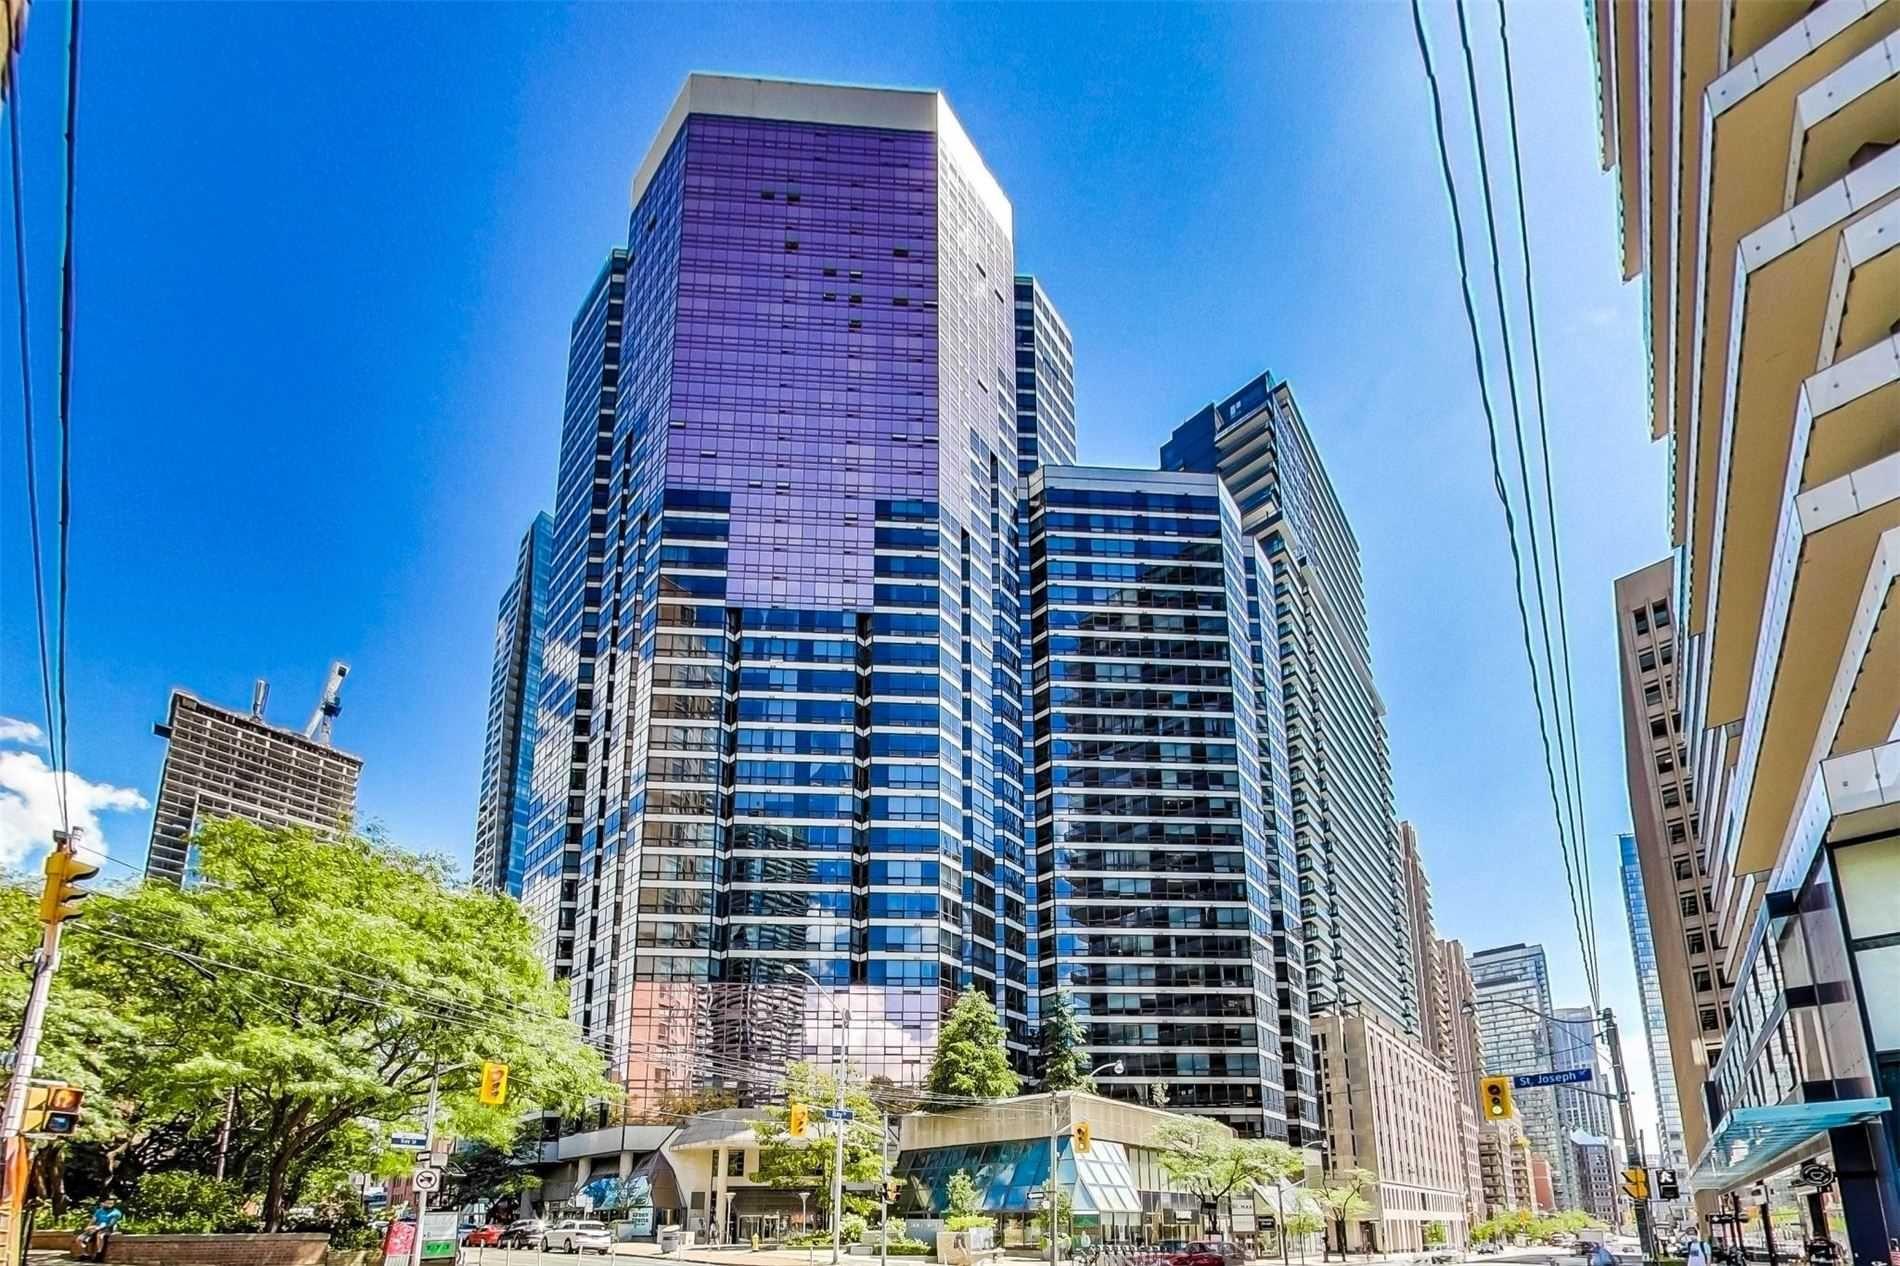 Main Photo: 508 1001 Bay Street in Toronto: Bay Street Corridor Condo for lease (Toronto C01)  : MLS®# C5094746